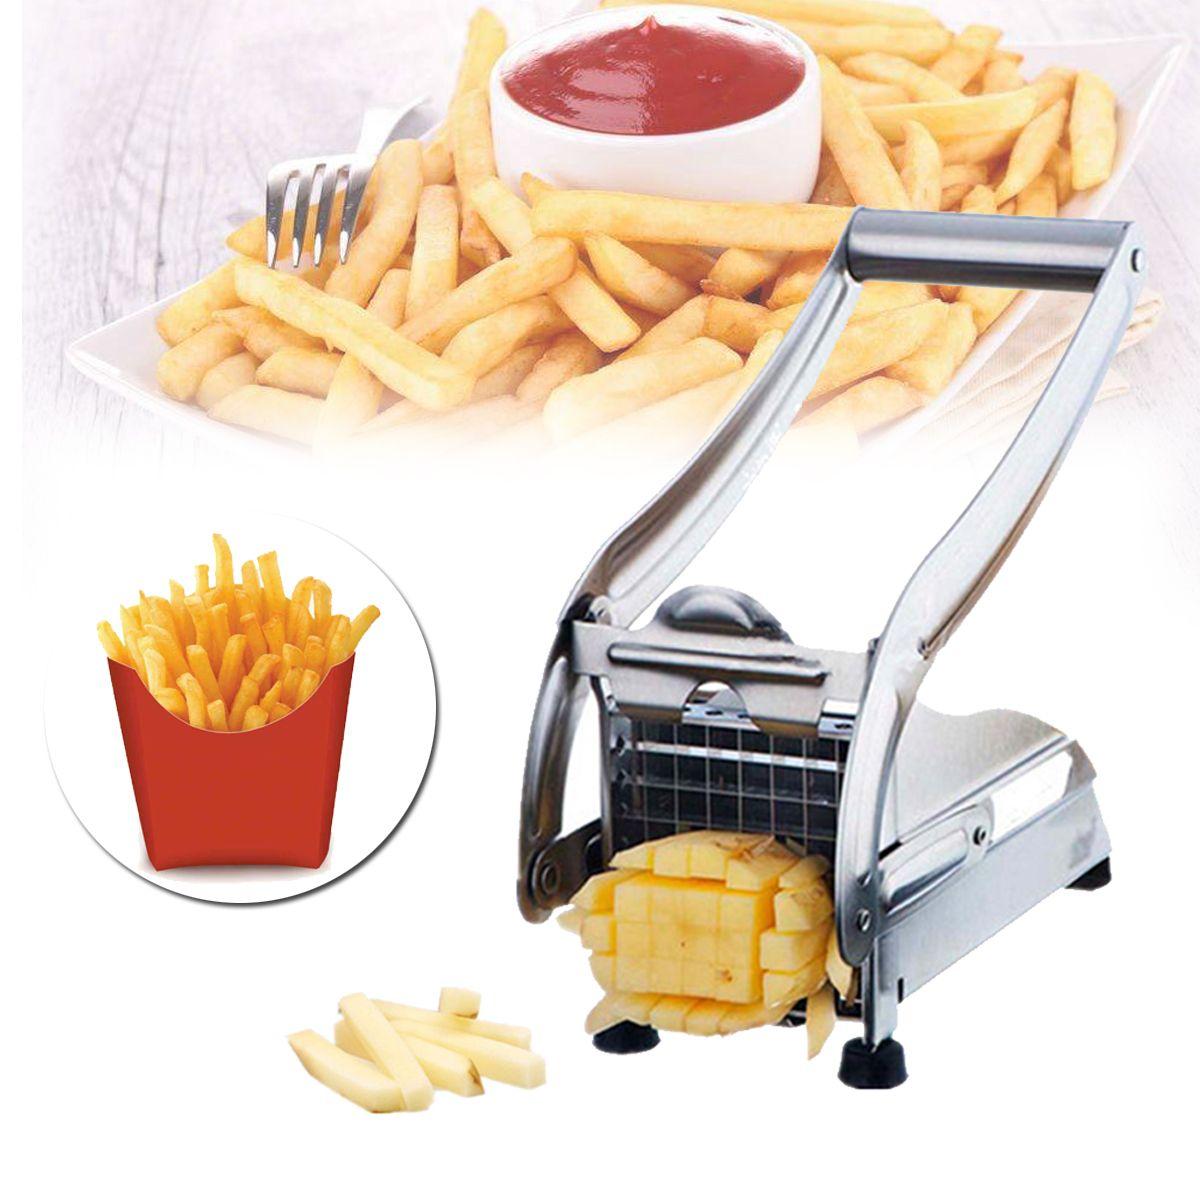 Potato Chipper Cutter Slicer French Fries Chip Vegetables Fruit Kitchen Tool UK